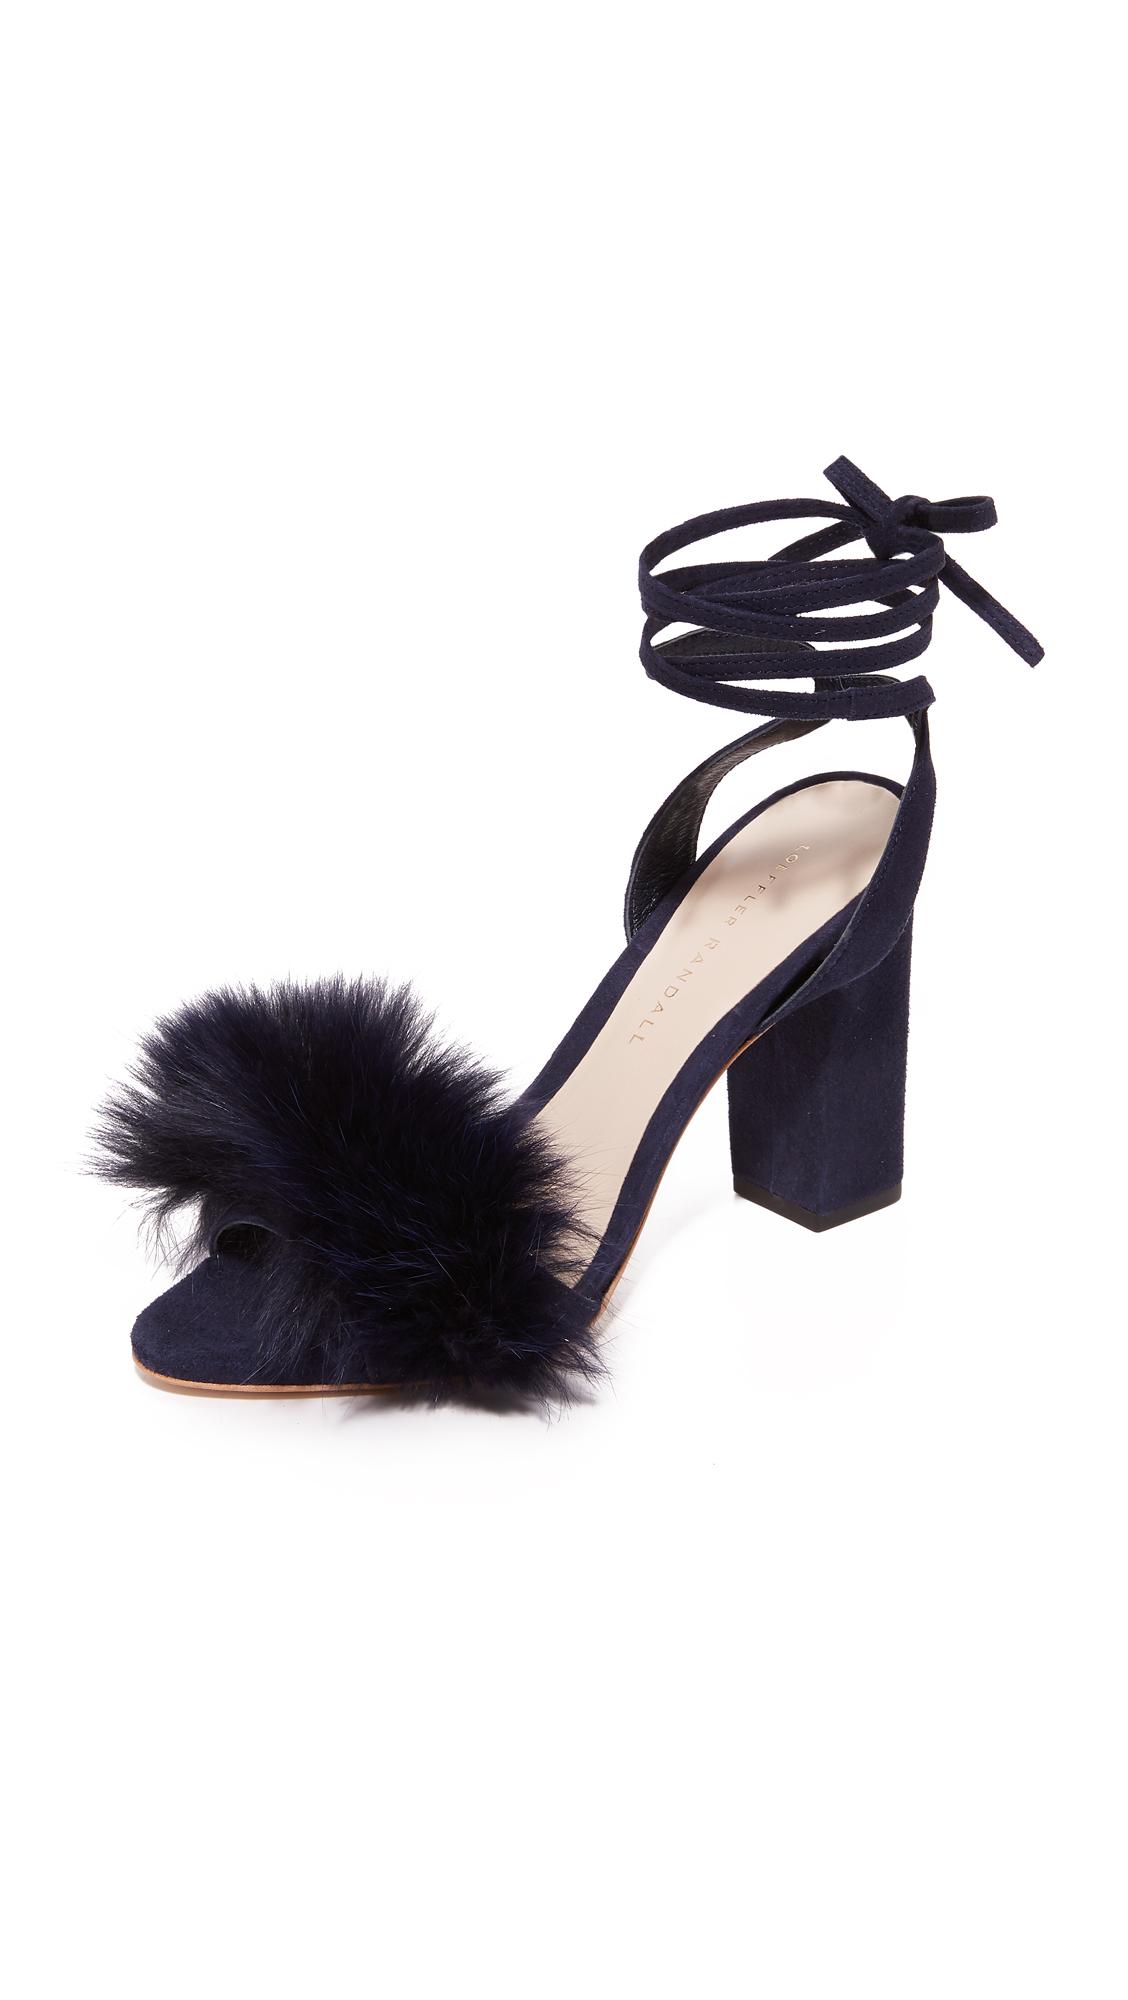 Loeffler Randall Nicolette Strappy Fur Sandals - Eclipse/Eclipse